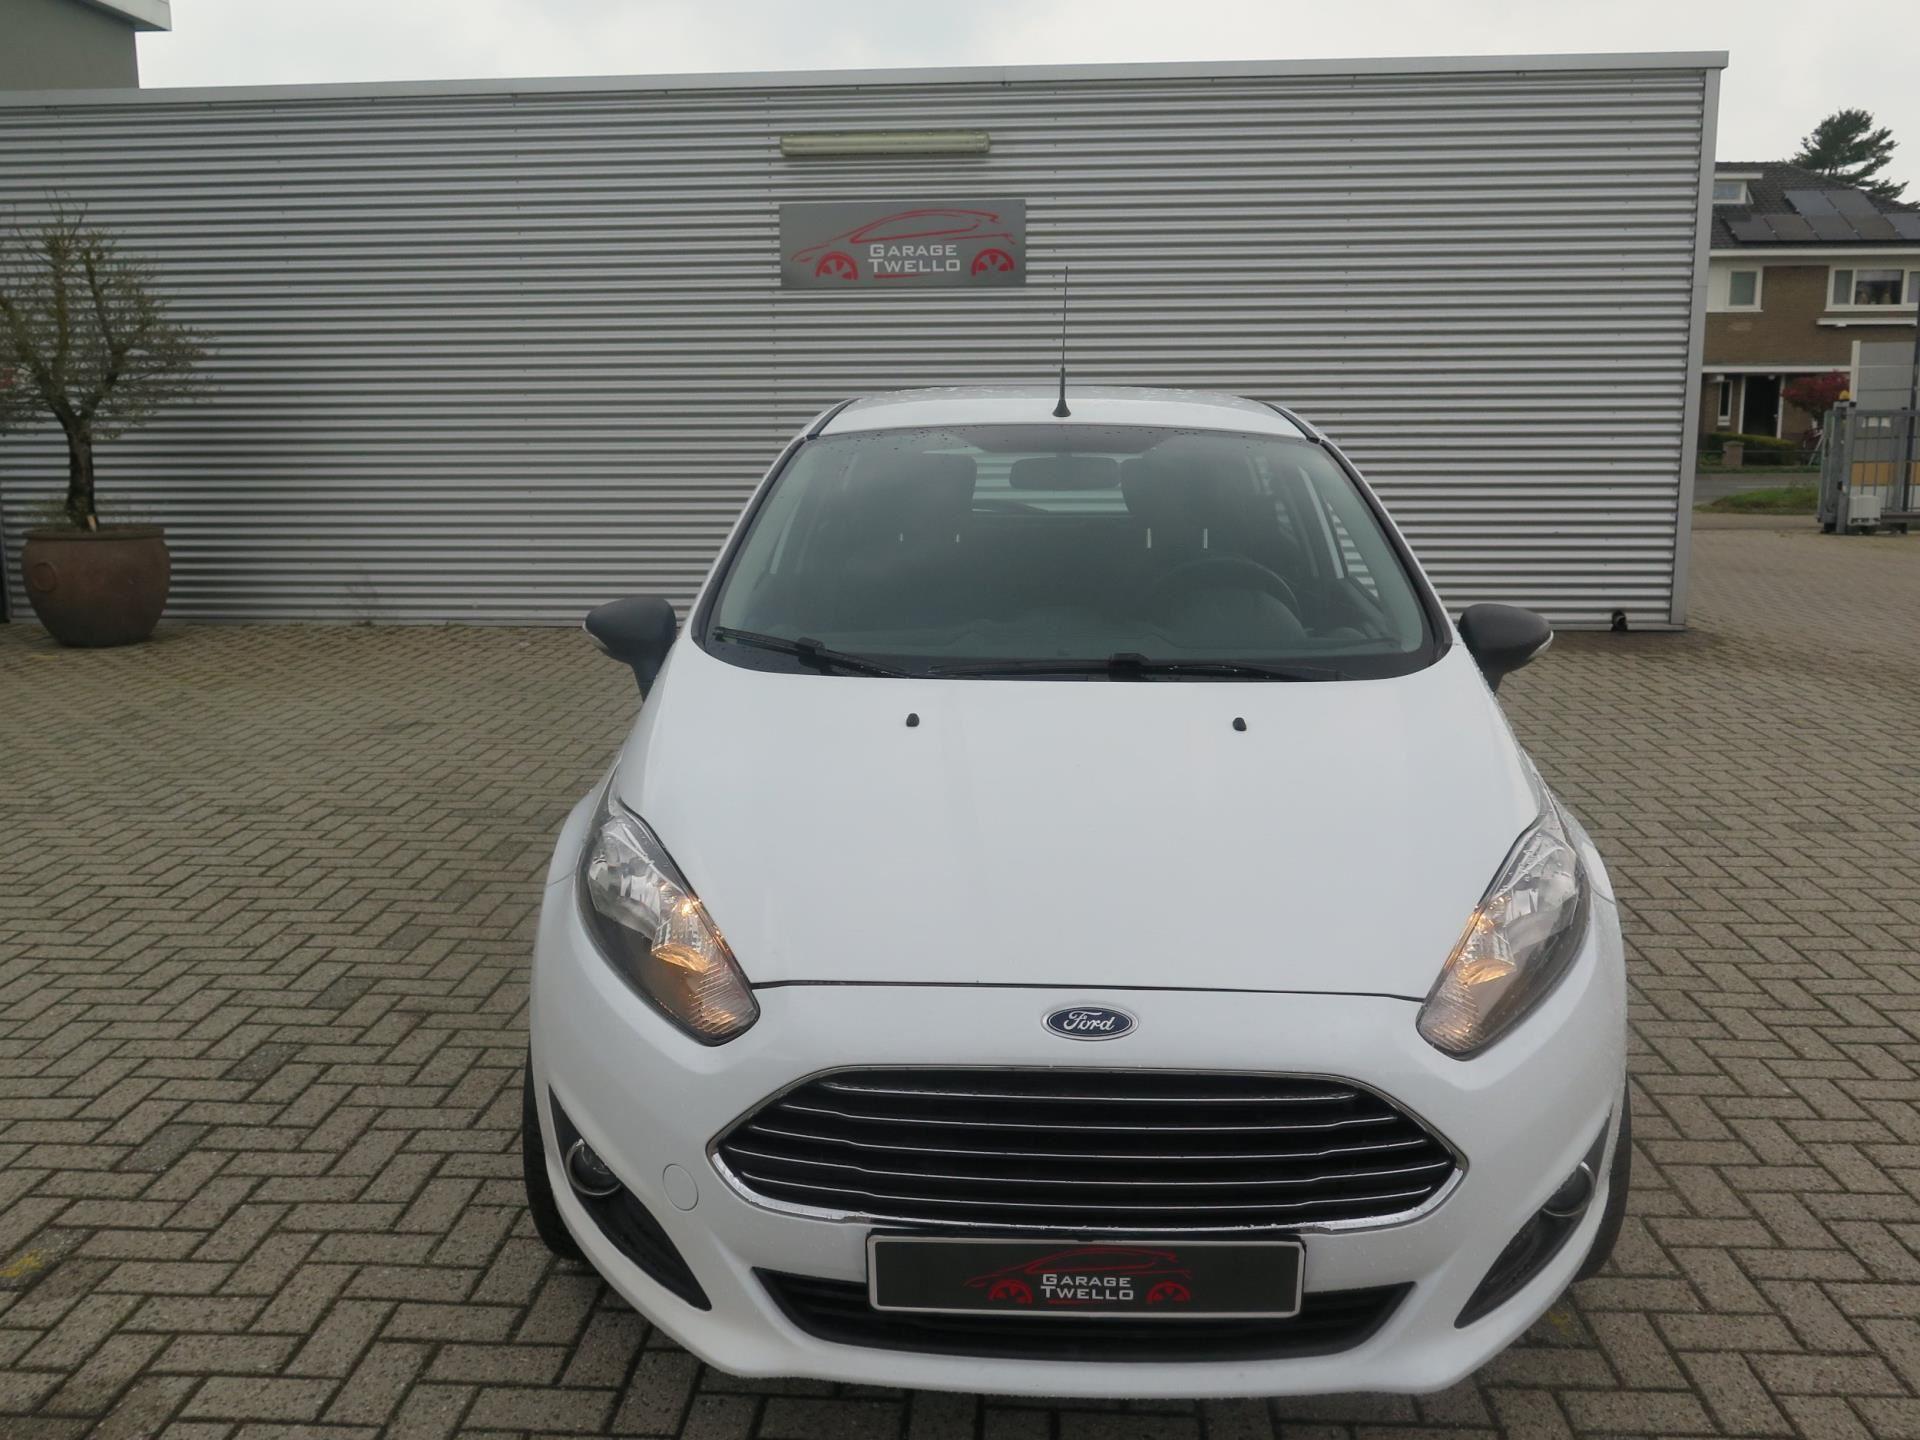 Ford Fiesta occasion - Garage Twello